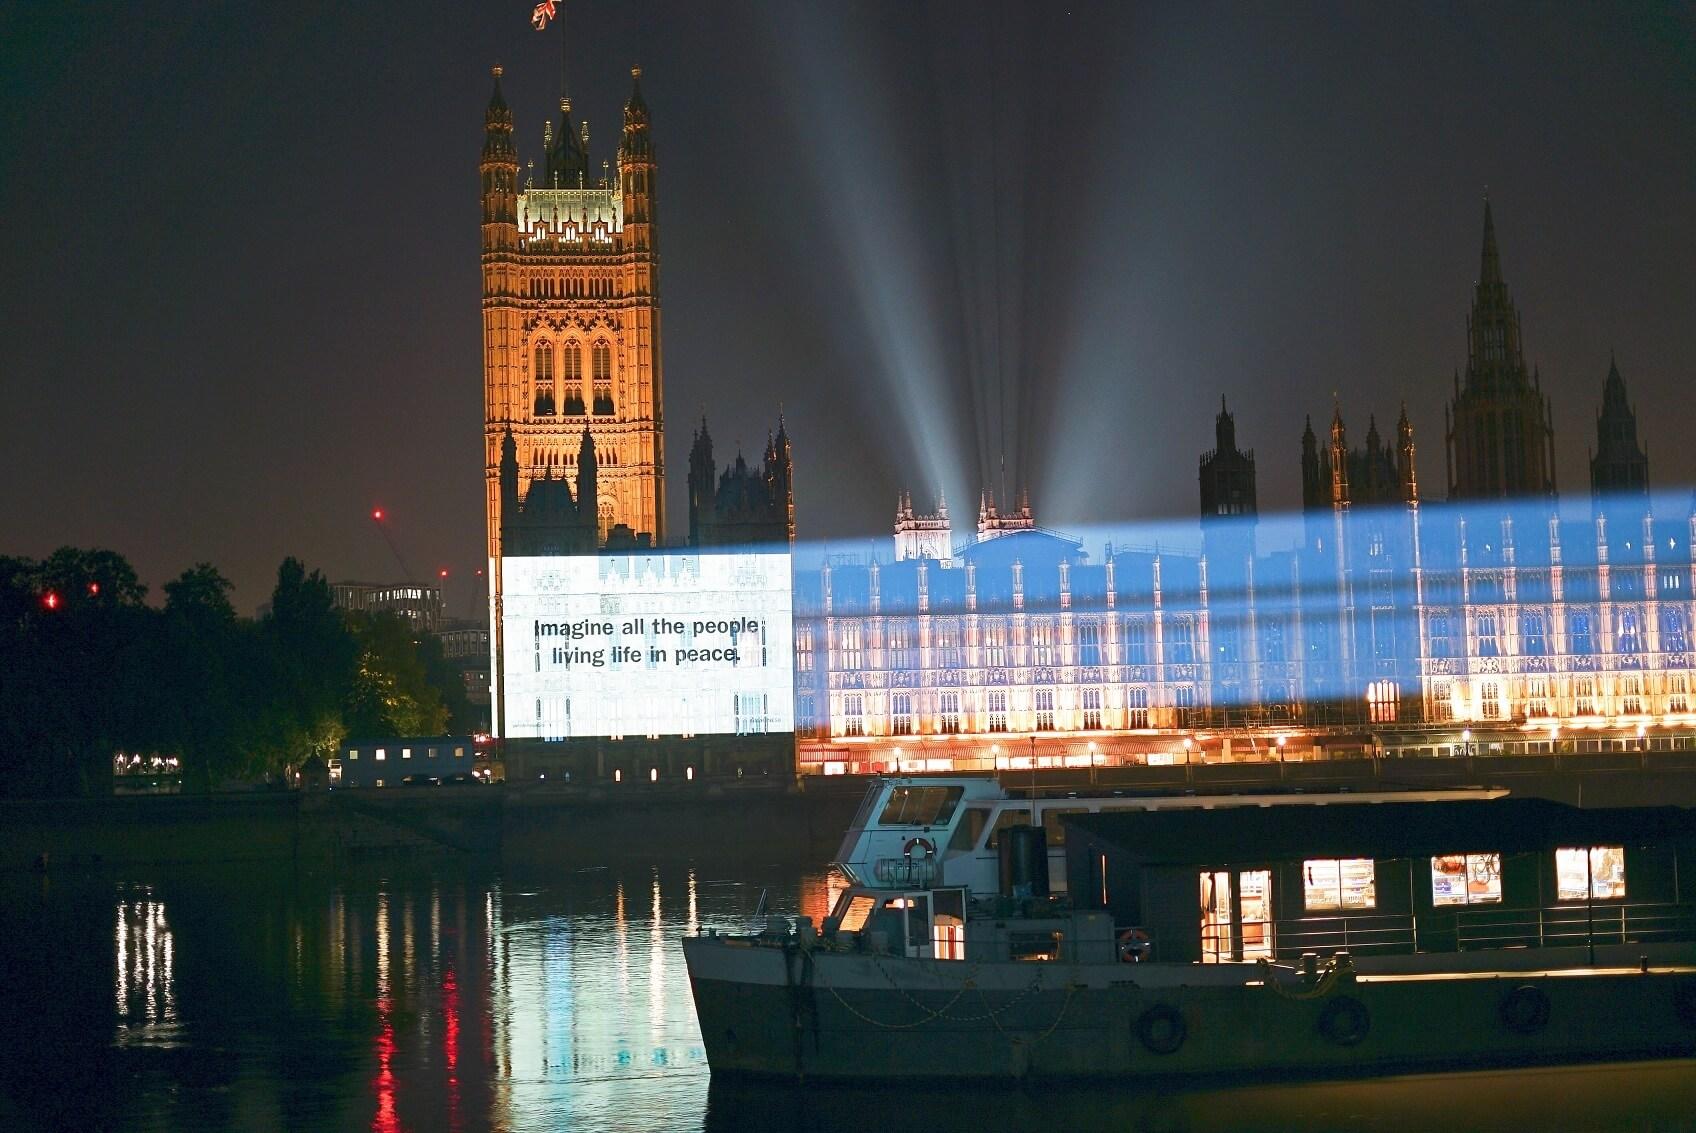 John Lennon & Yoko Onoの名曲「Imagine」不朽の一節「IMAGINE ALL THE PEOPLE LIVING LIFE IN PEACE」が世界中の有名な建築物に投影